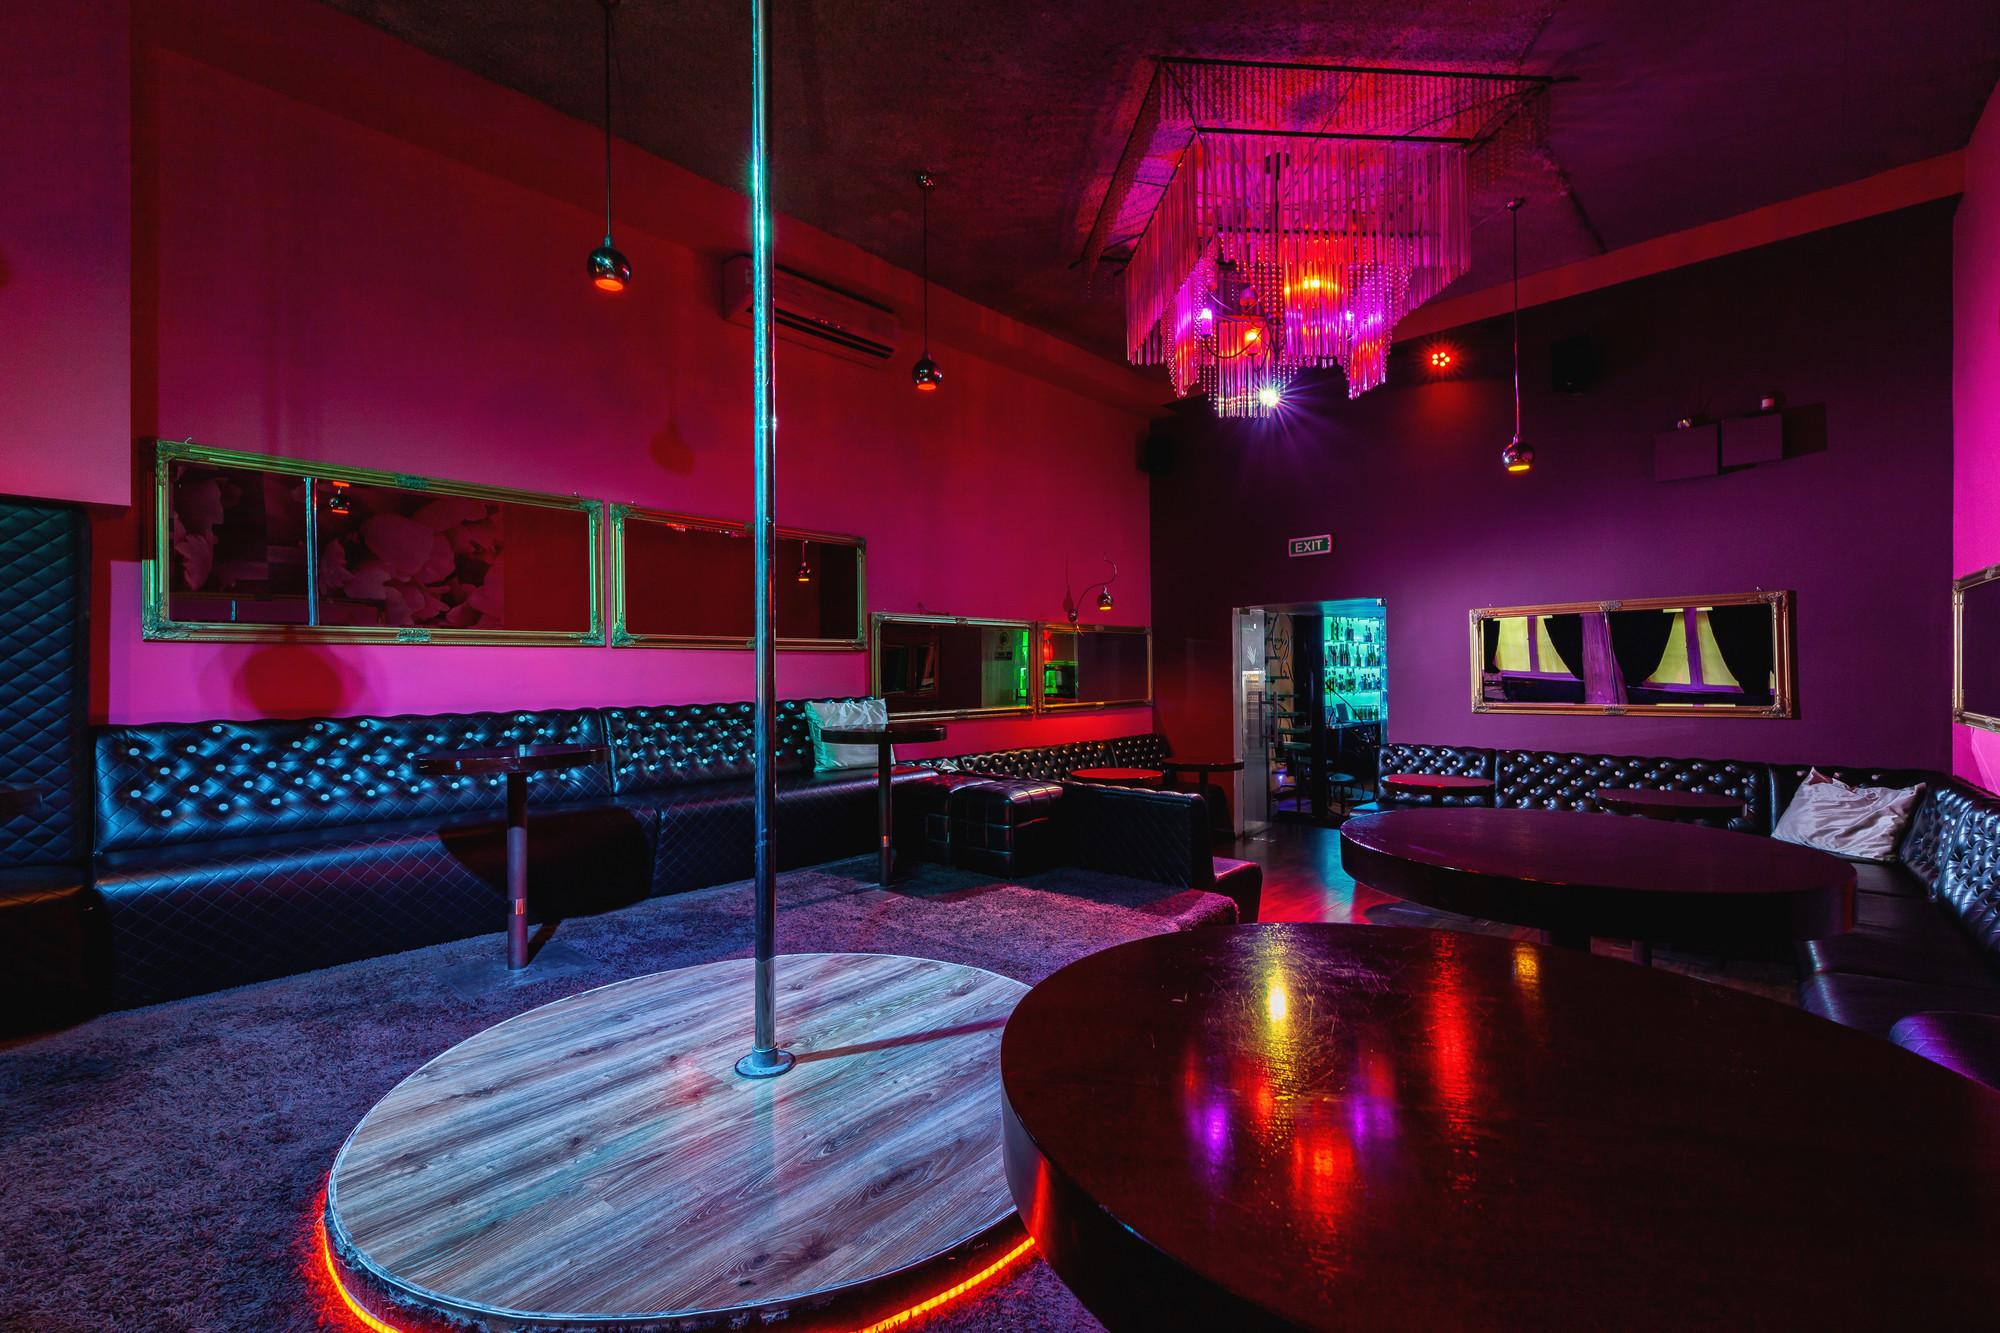 Strip clubs in milan